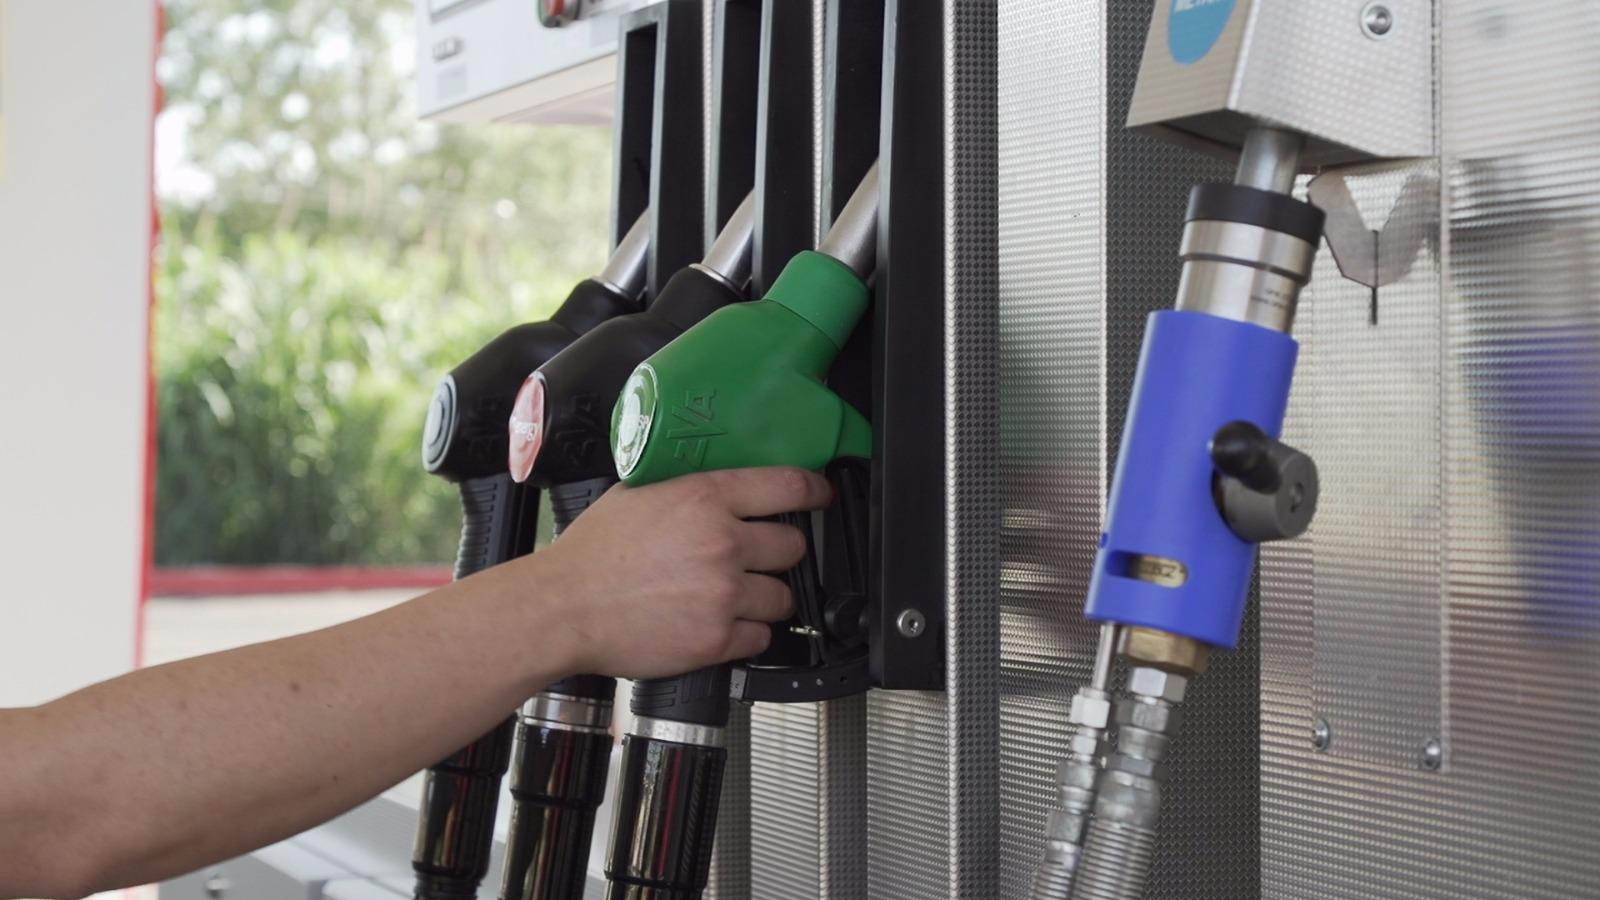 https://www.newenergycarburanti.it/wp-content/uploads/2018/09/WhatsApp-Image-2018-07-19-at-16.33.06-1.jpeg